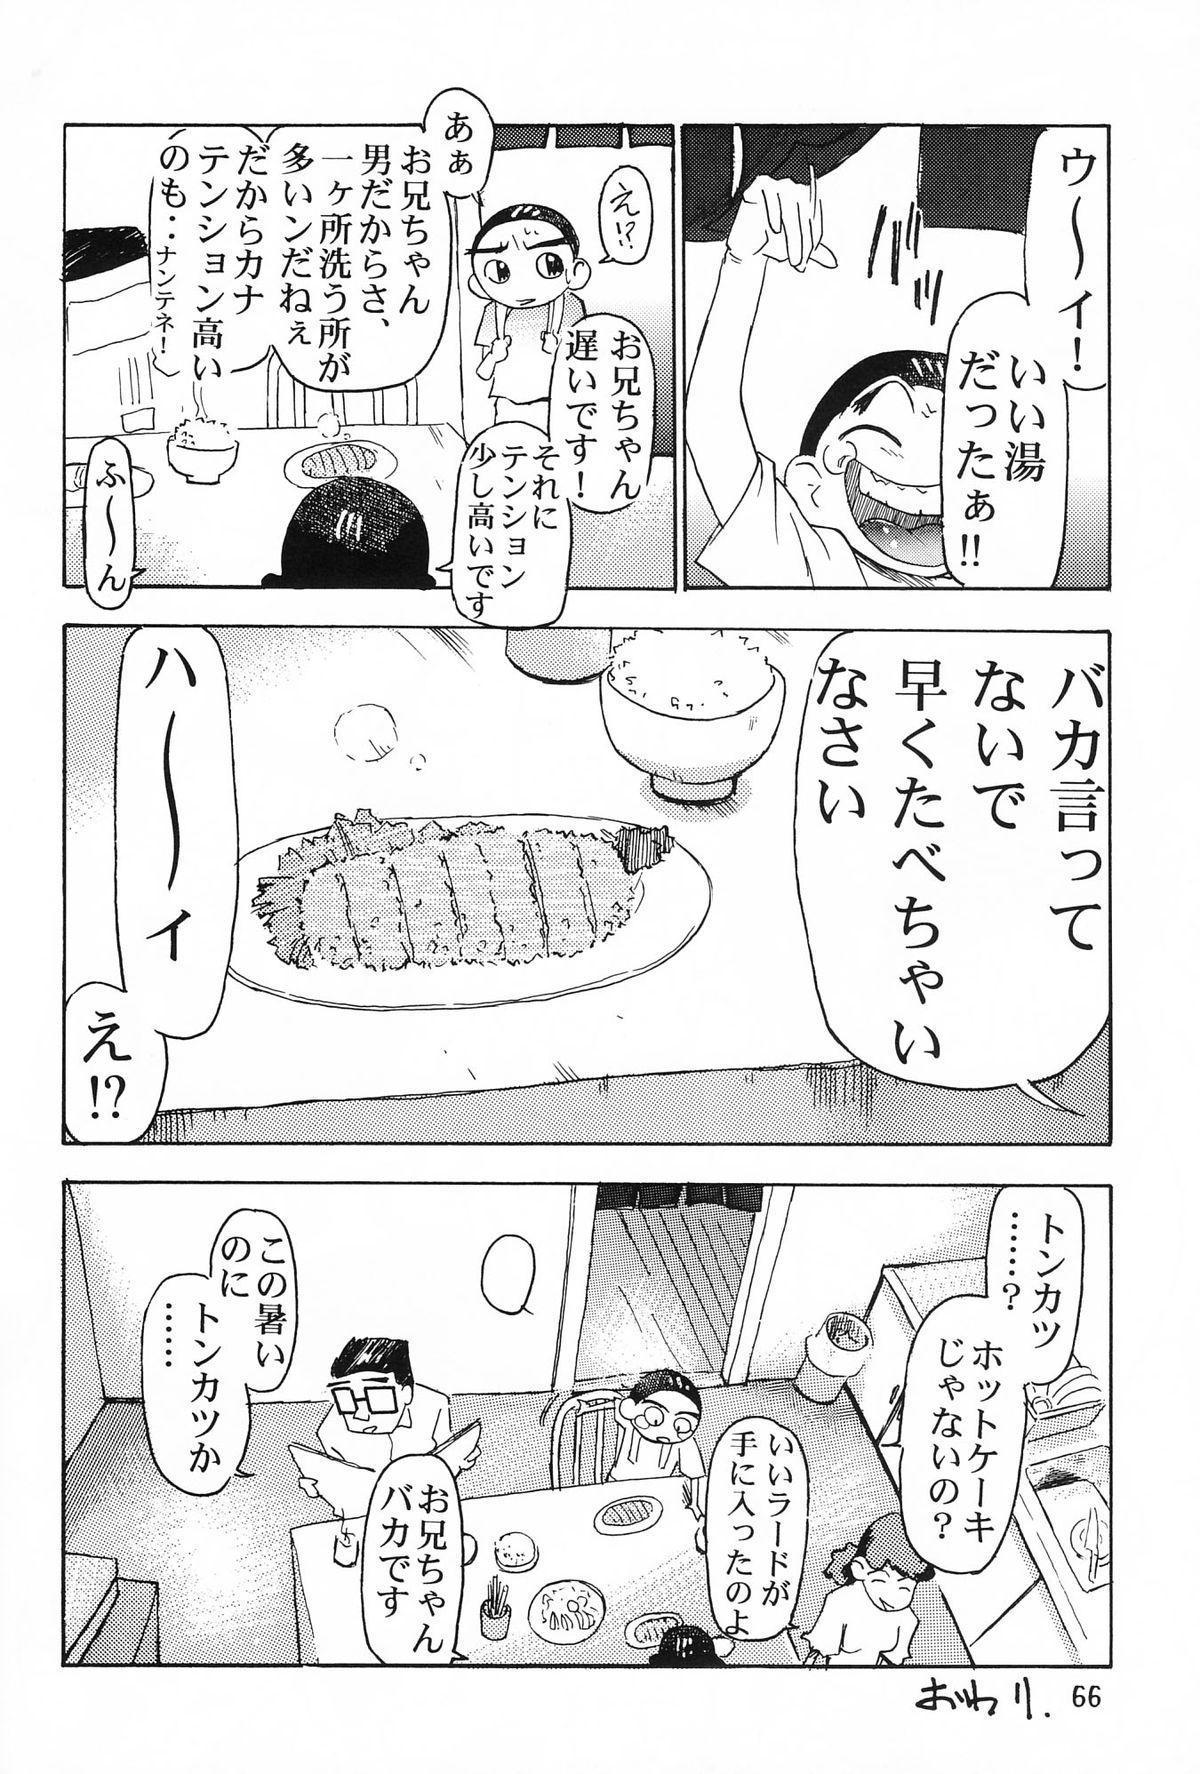 Henrei-kai '98 Natsu SPECIAL 65